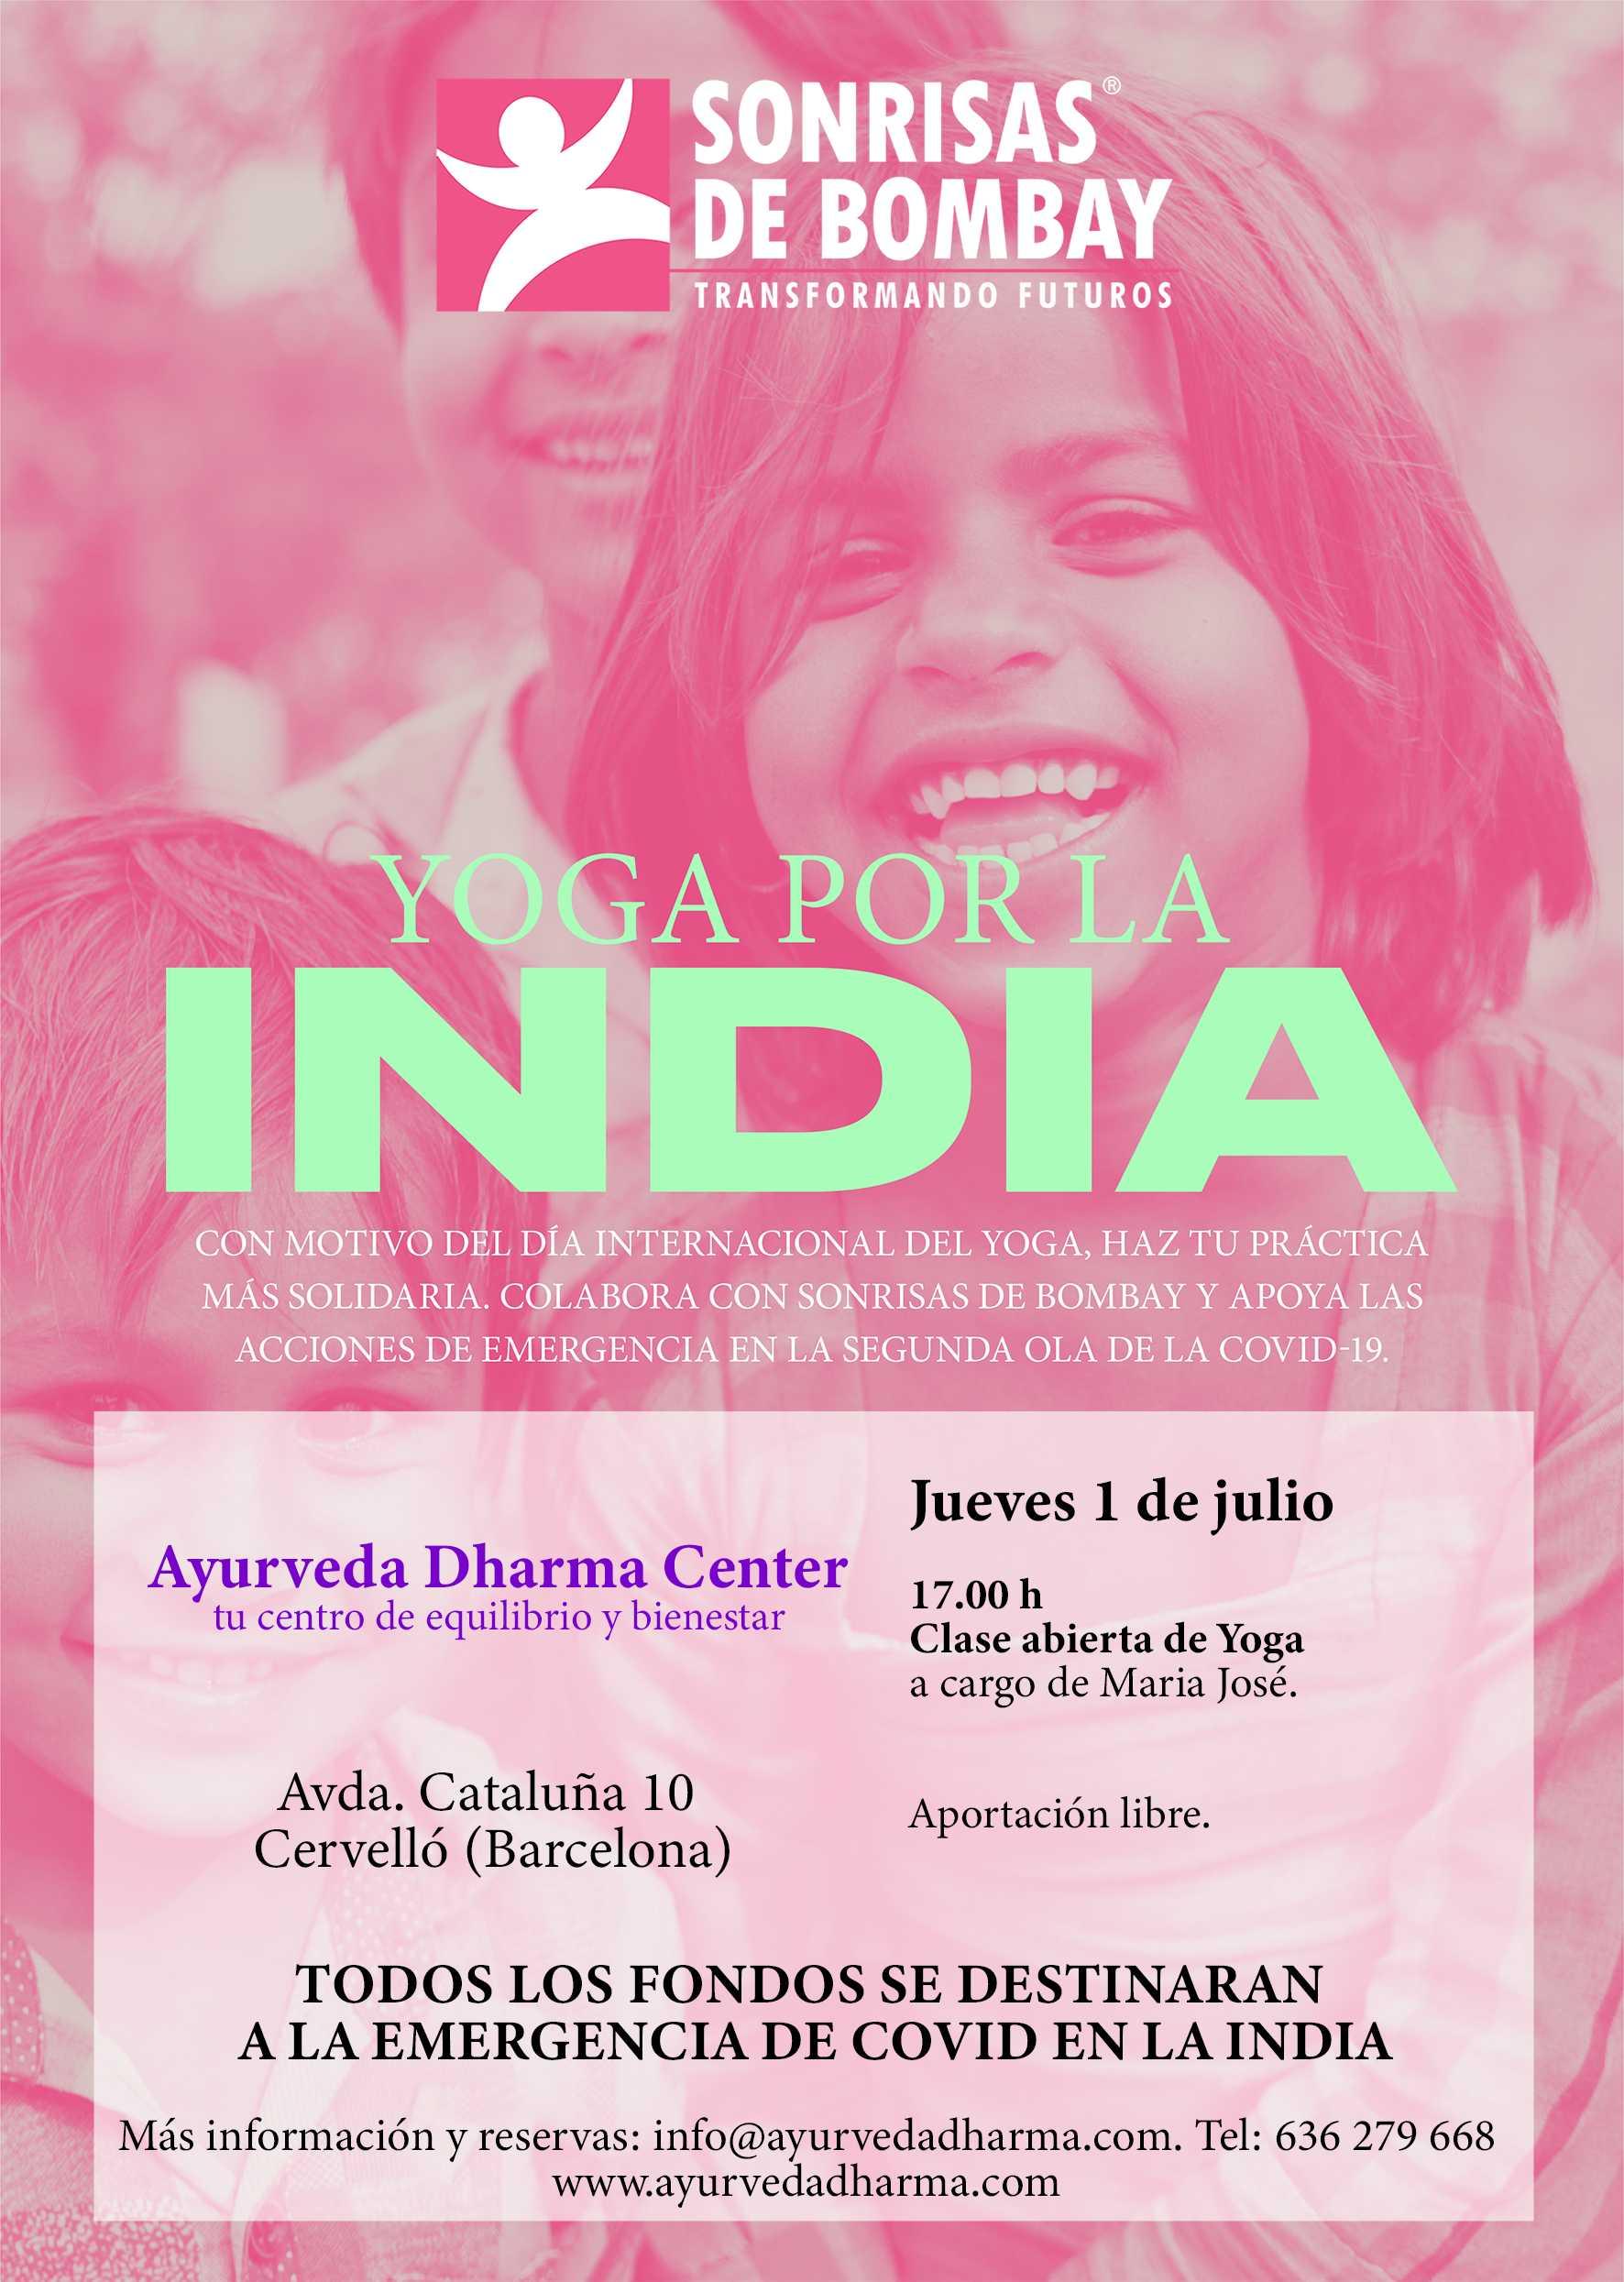 Ayurveda Dharma Center- Yoga por la India